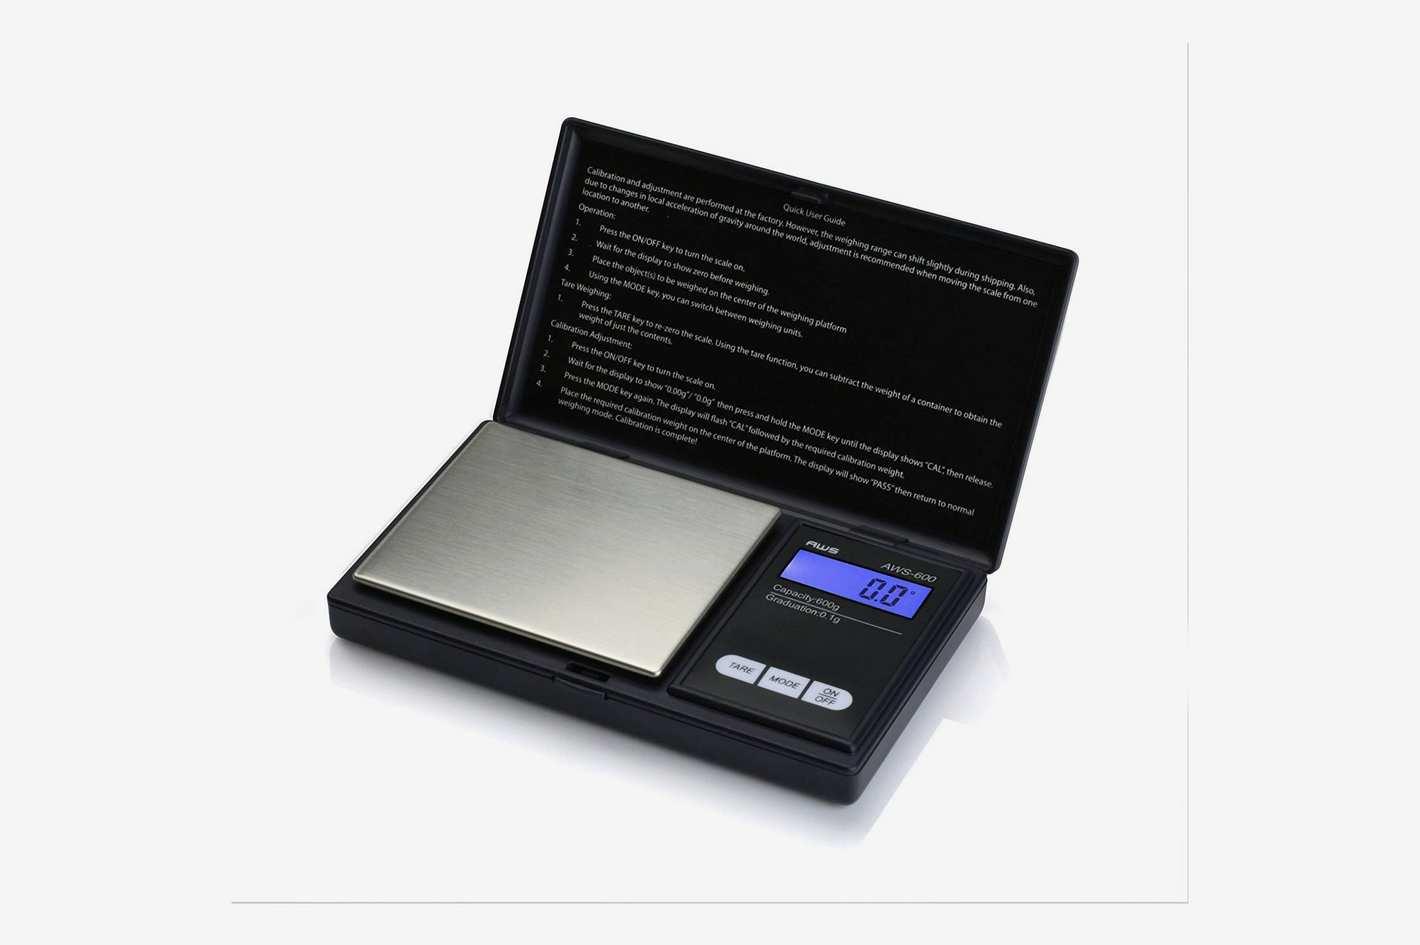 eatsmart precision digital kitchen scale